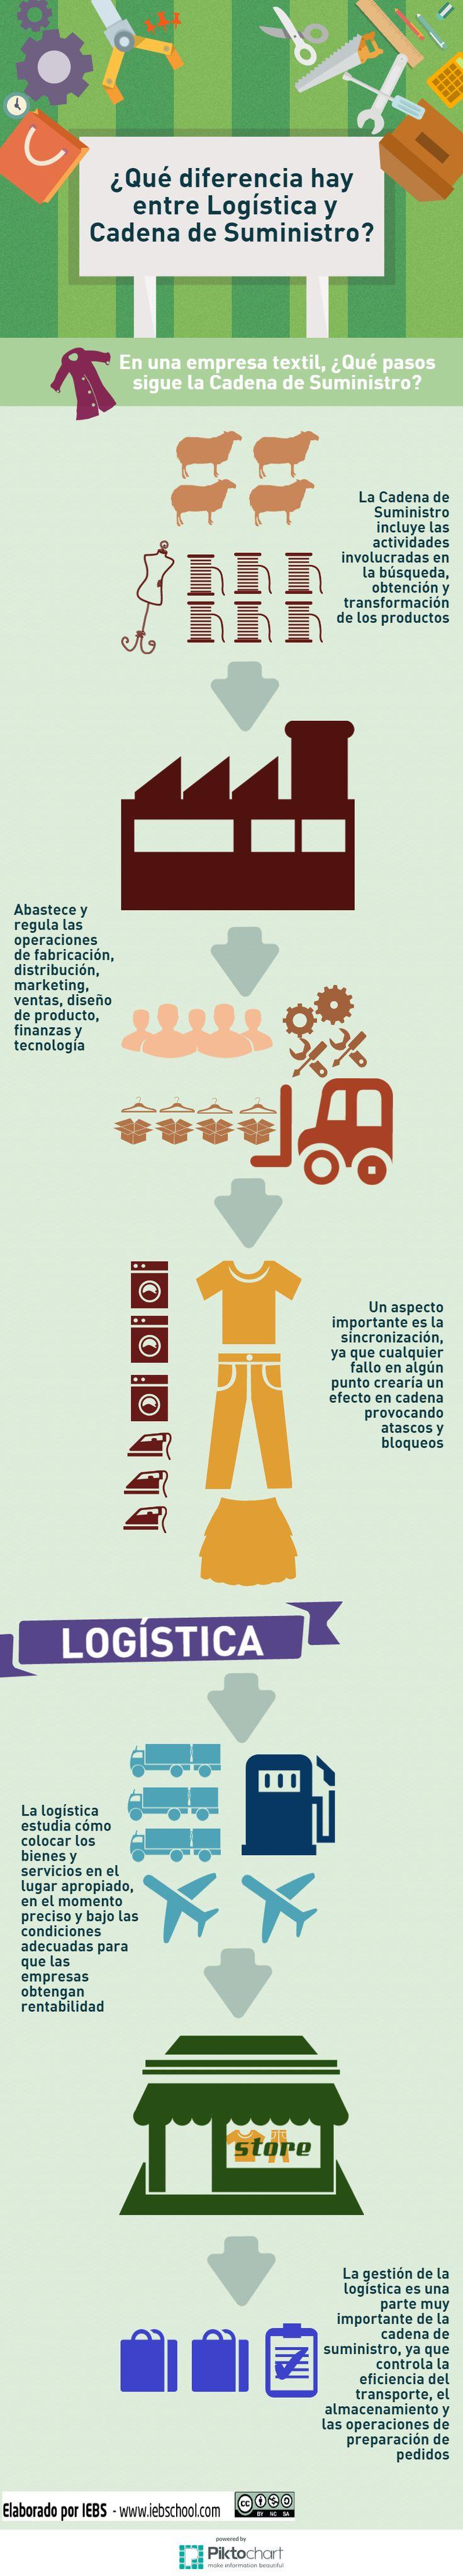 ¿En qué se diferencian #logística de cadena de suministro? vía @alfredovela